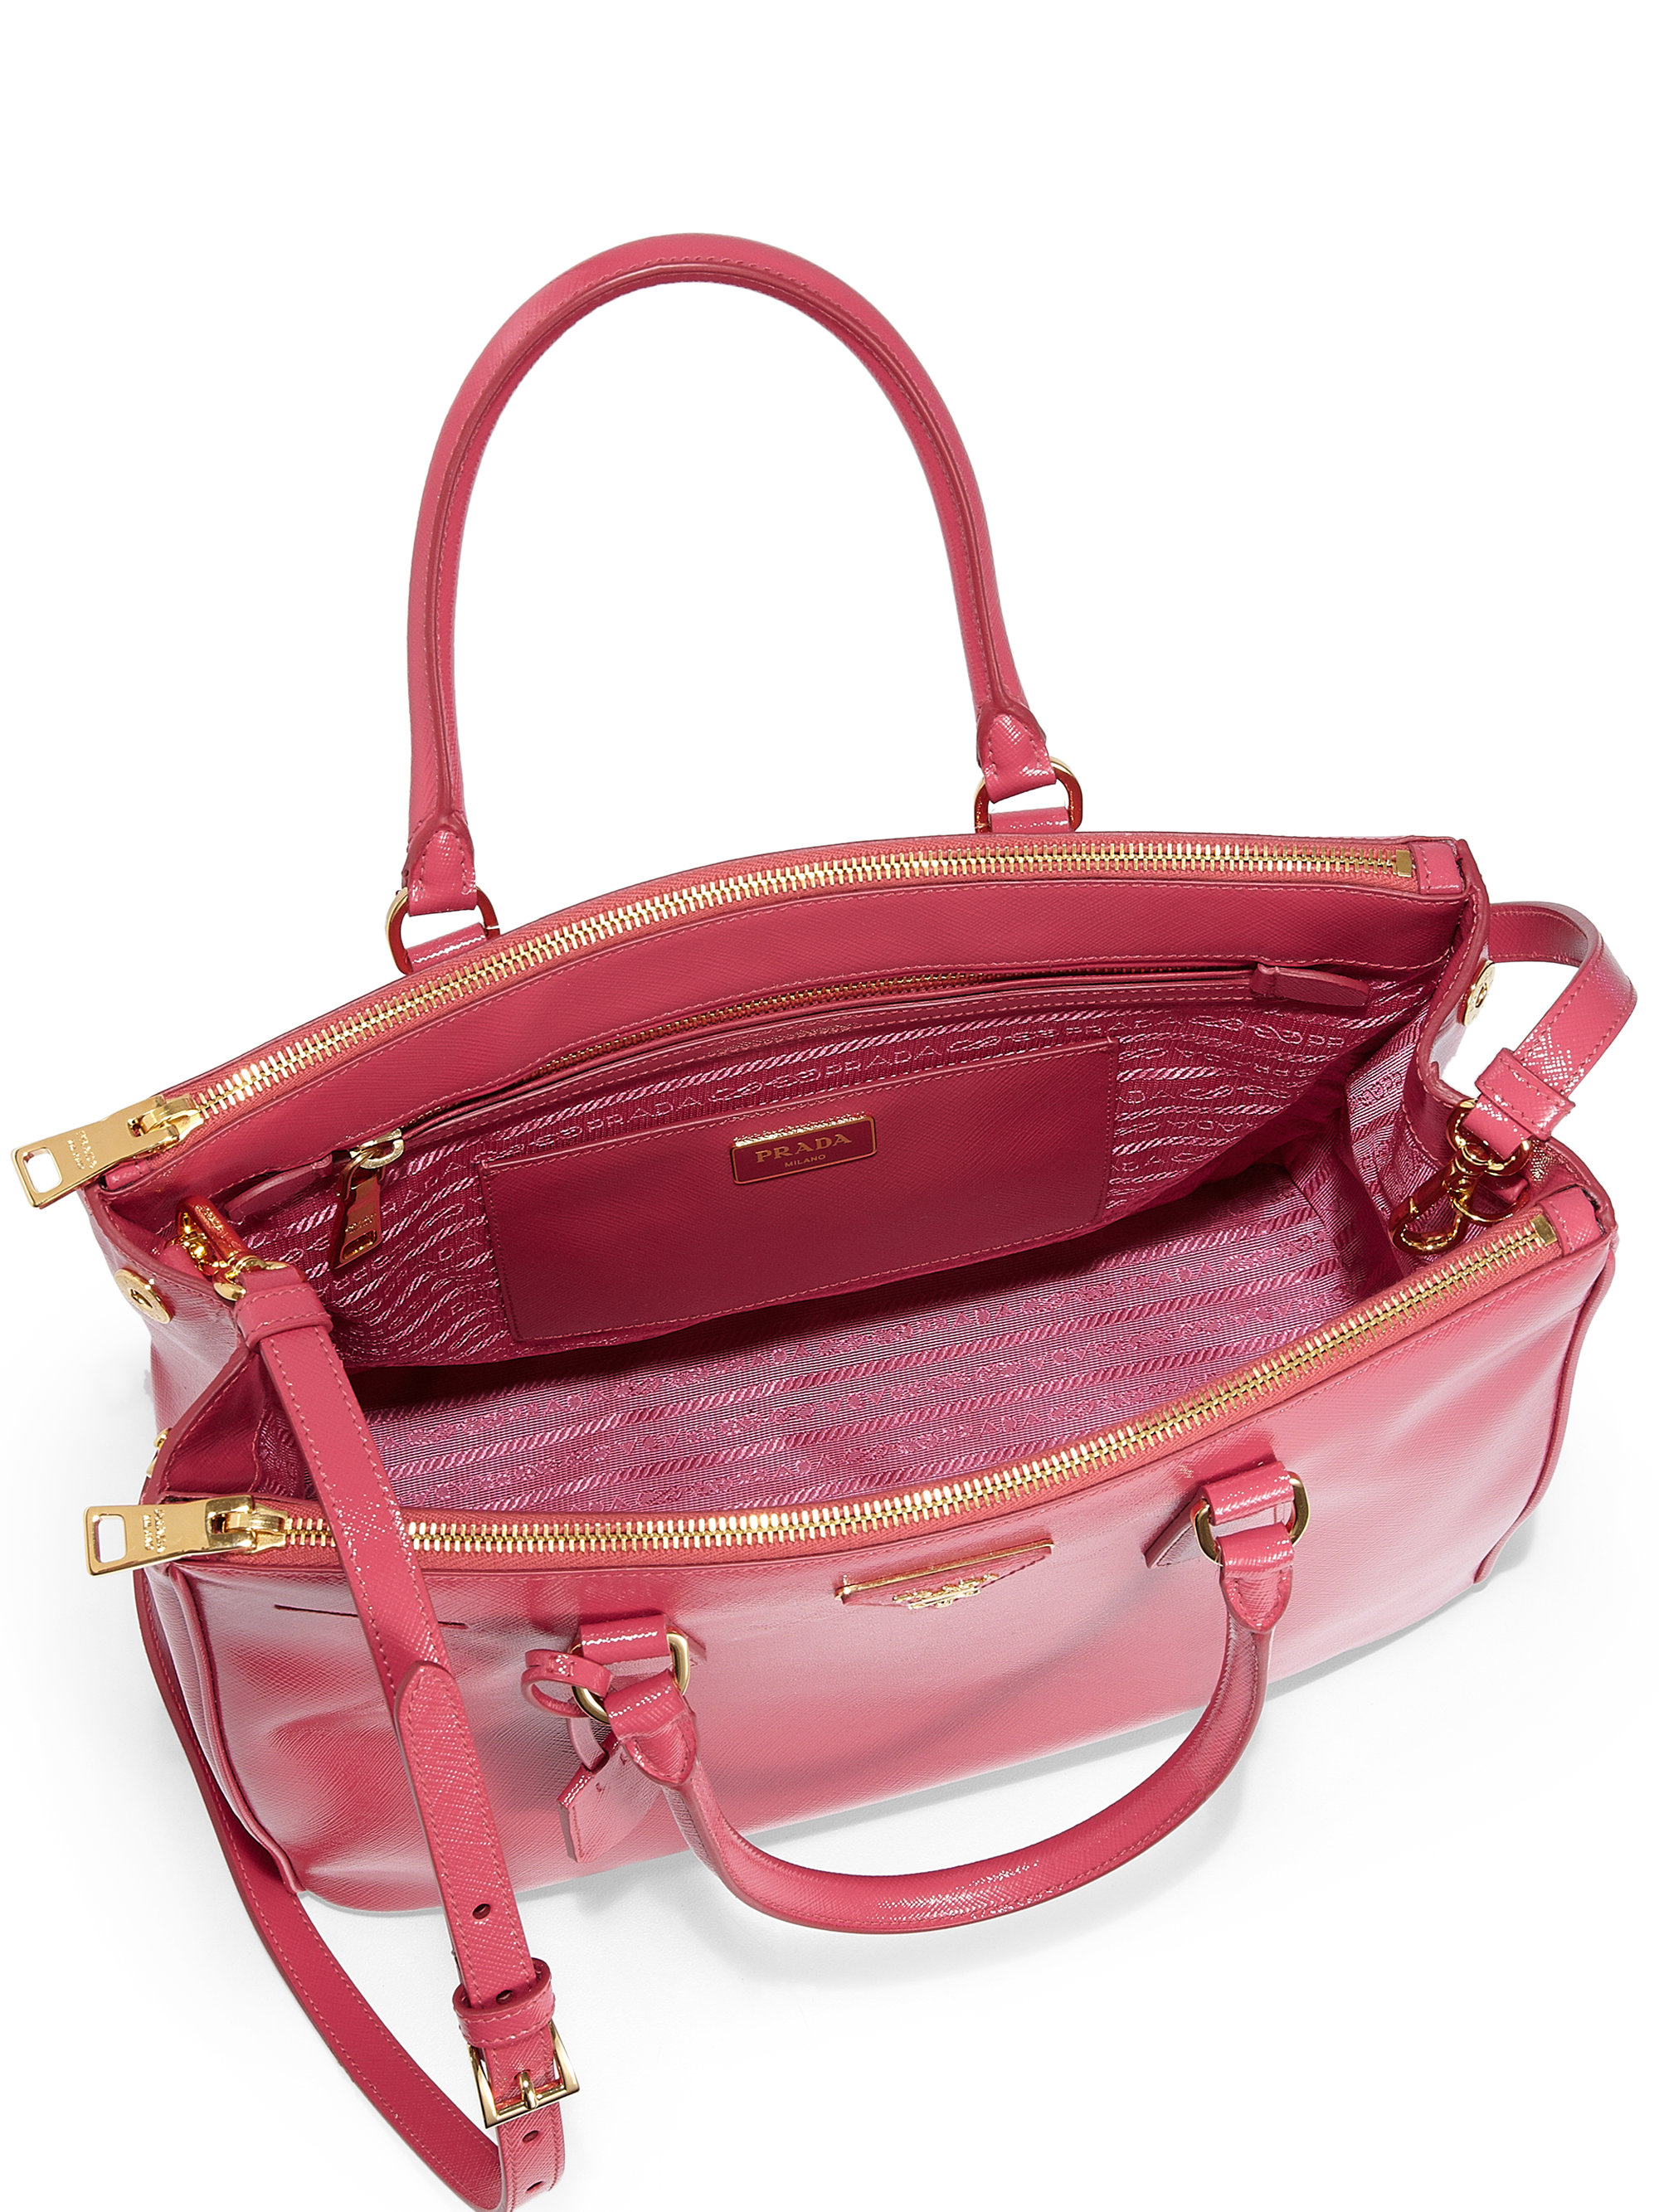 dark blue purse - Prada Saffiano Vernice Zip Tote in Pink (PEONIA-PINK)   Lyst